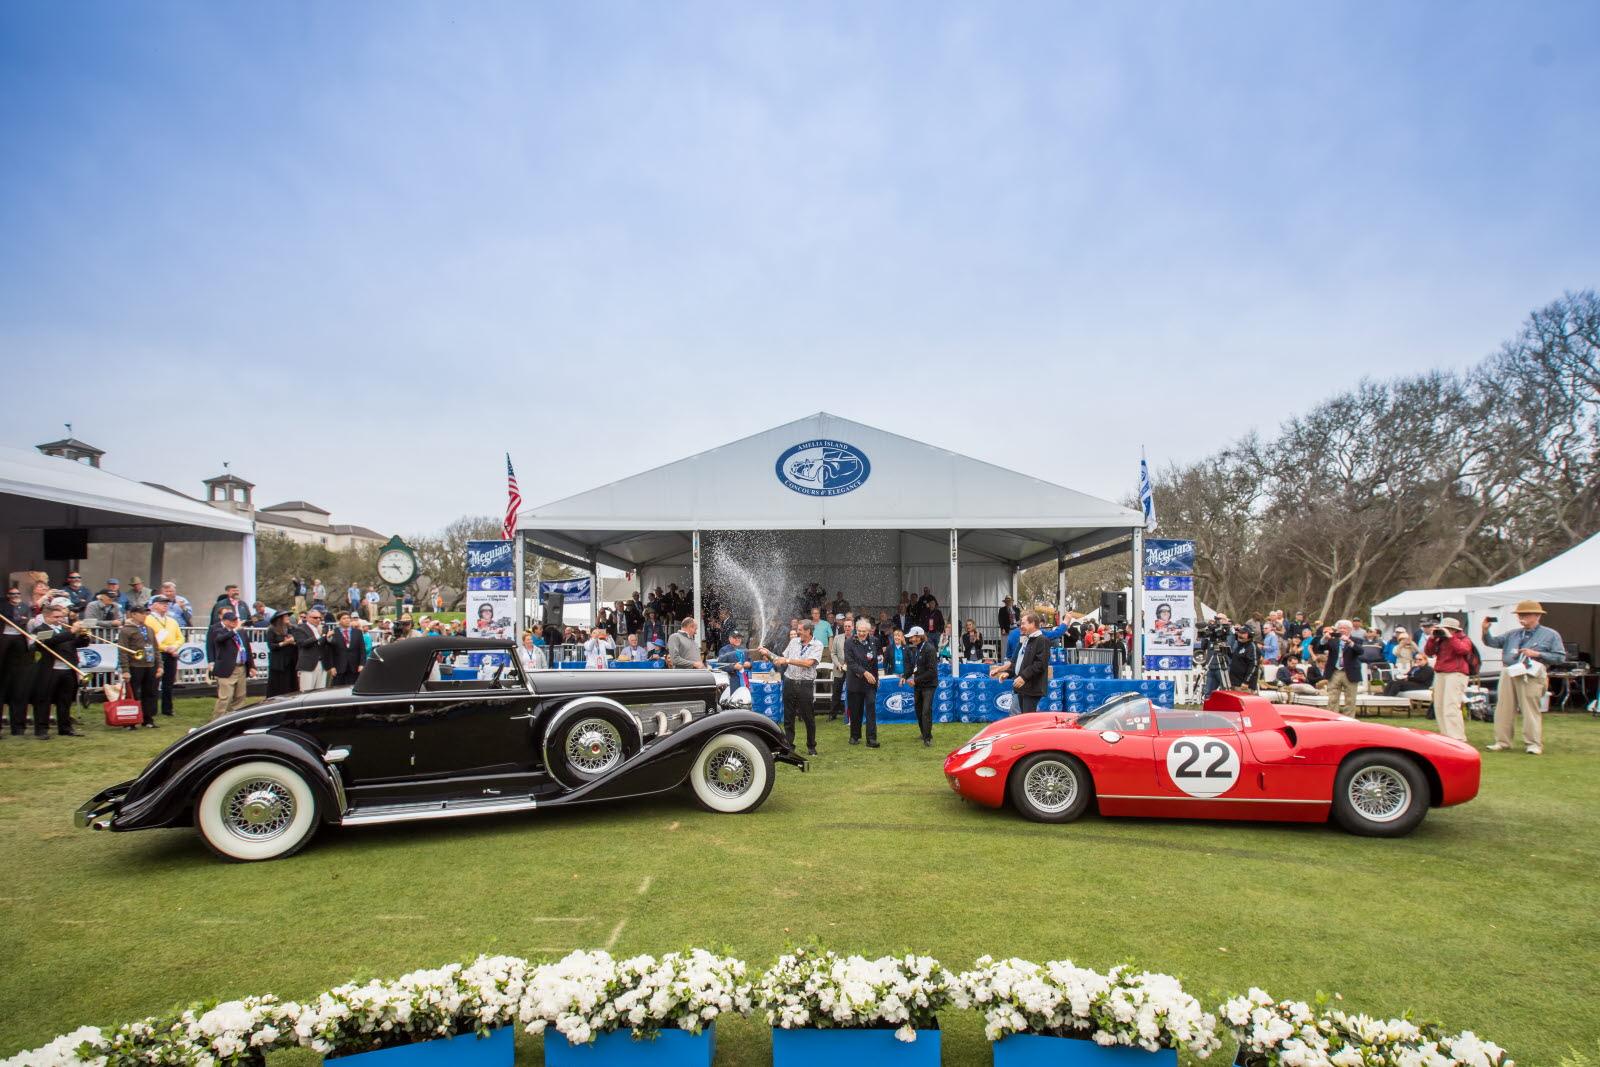 Best in show winners at the 23rd annual Amelia Island Concours d'Elegance, 1929 Duesenberg J/SJ Convertible and 1963 Ferrari 250/275P. [Photo courtesy Deremer Studios LLC]